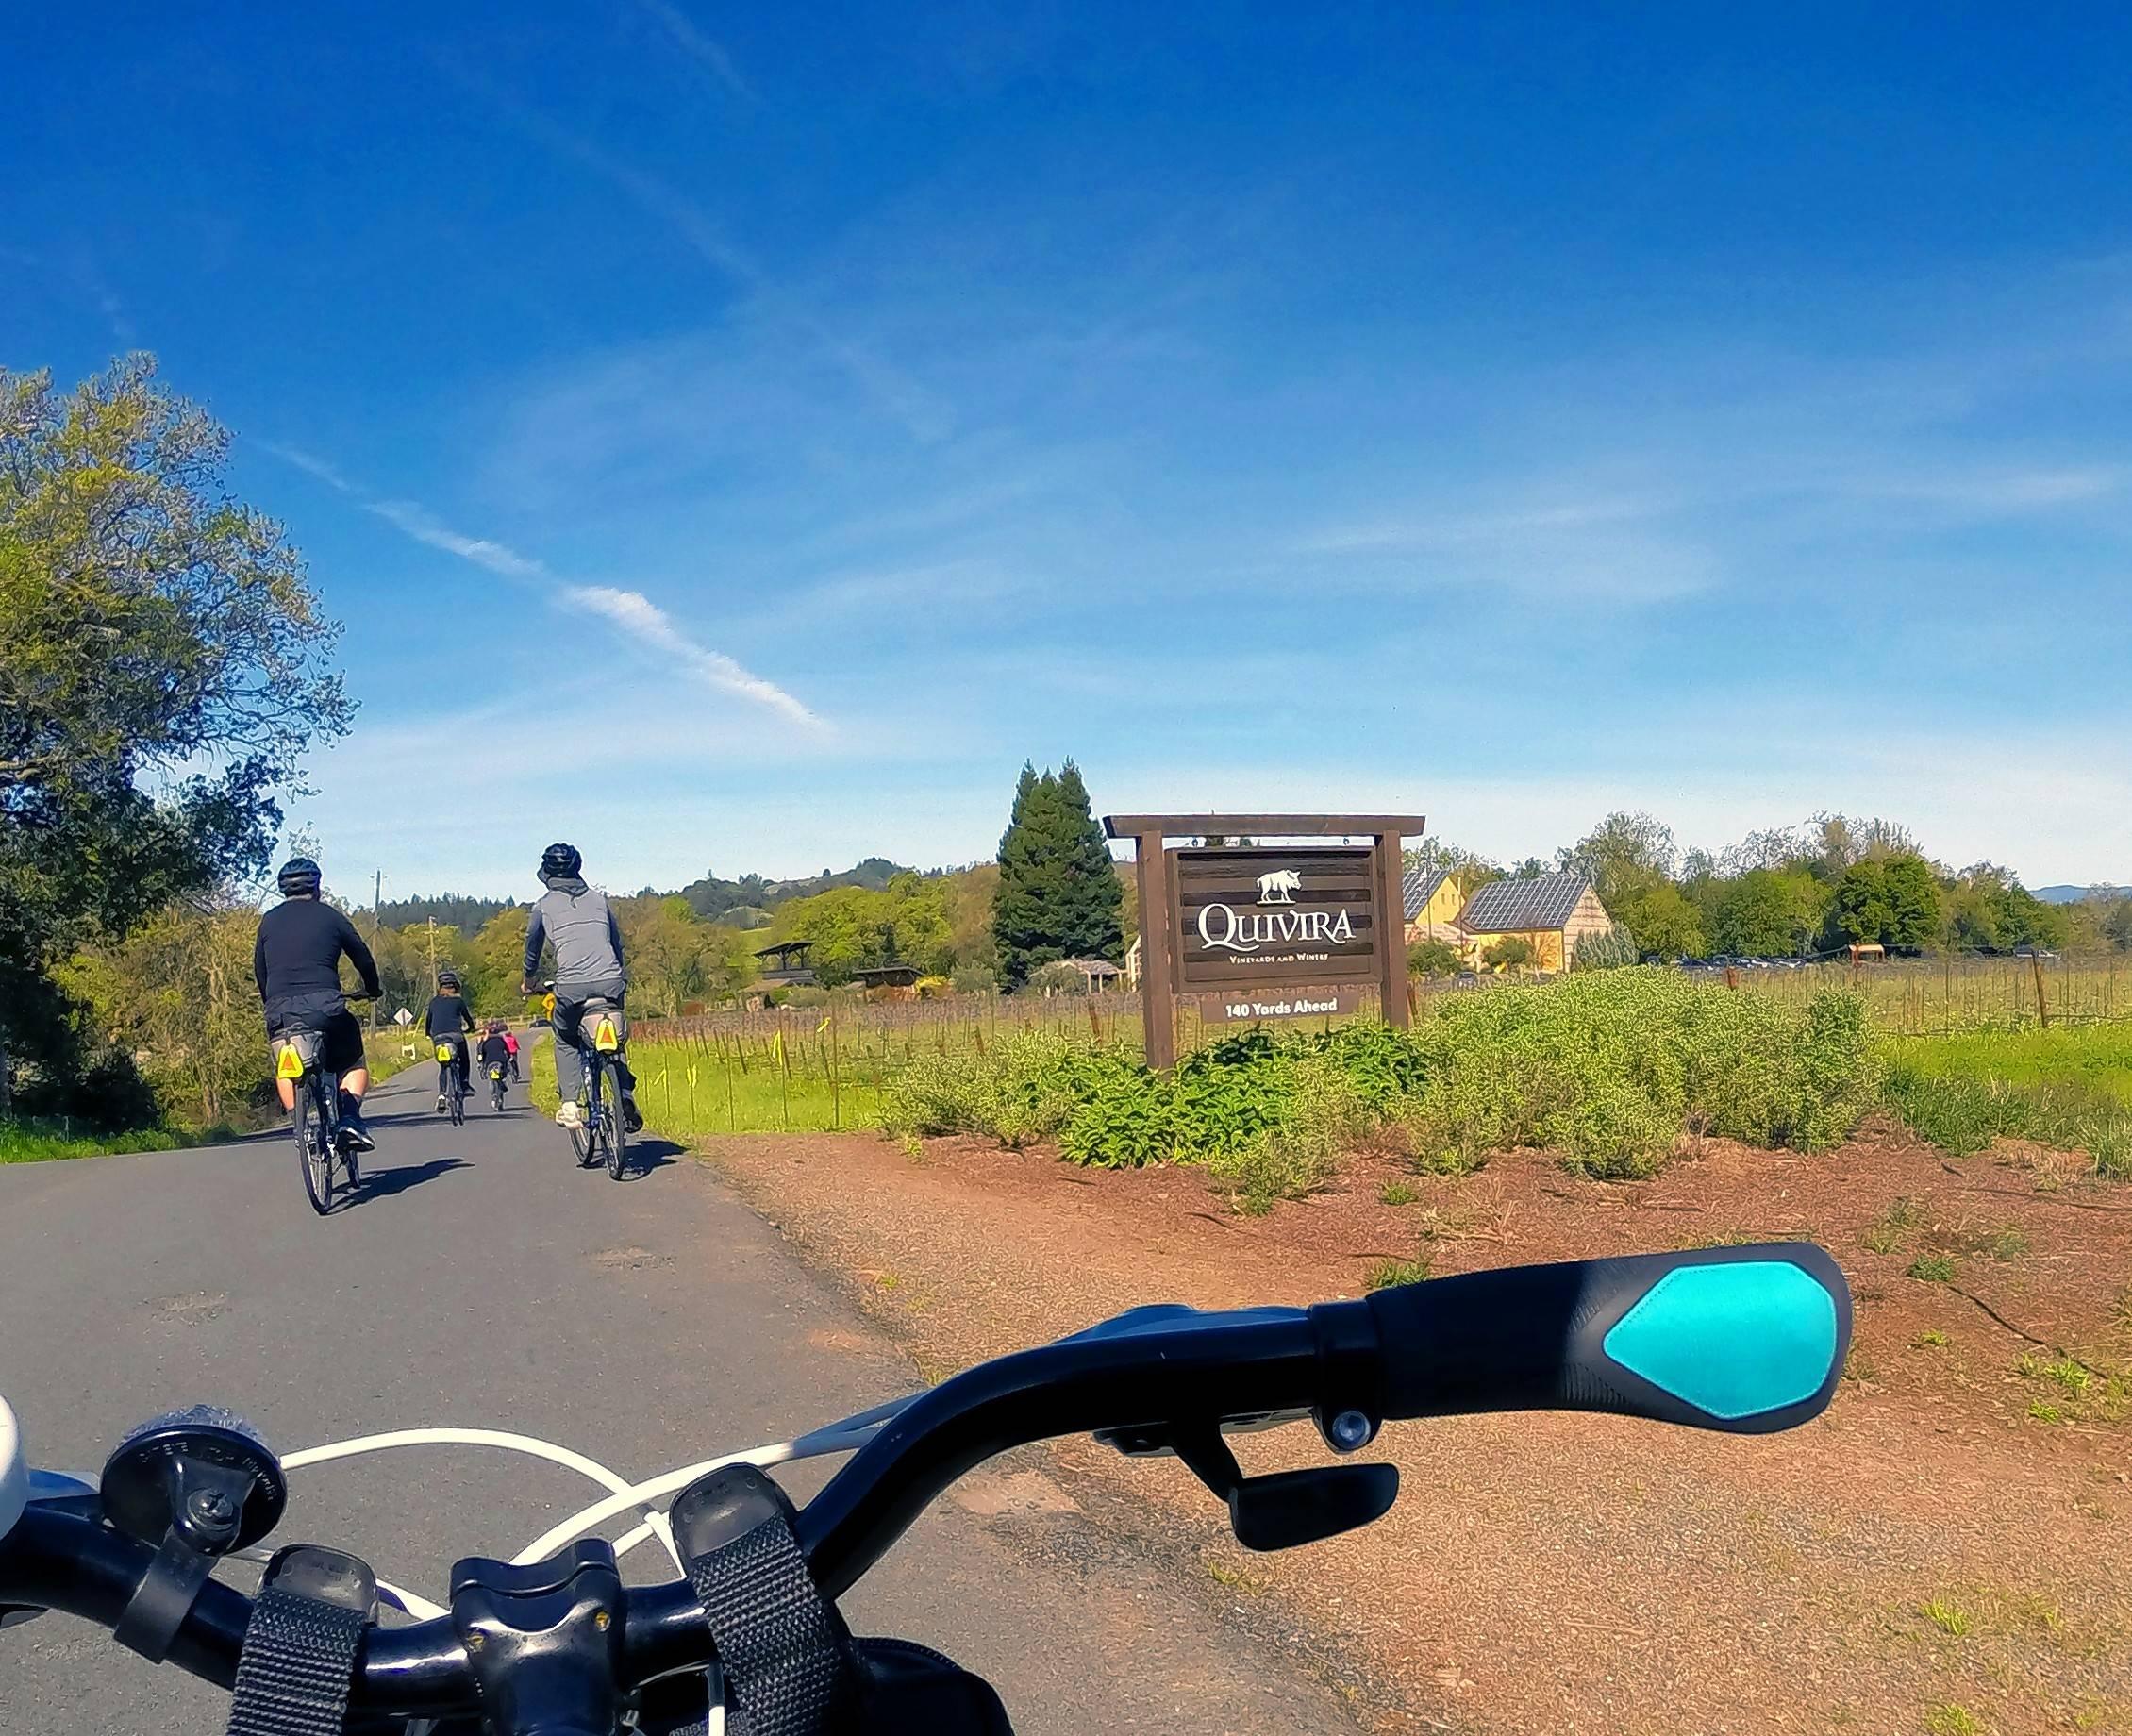 No whining on hiking, biking tours along Sonoma County vineyards